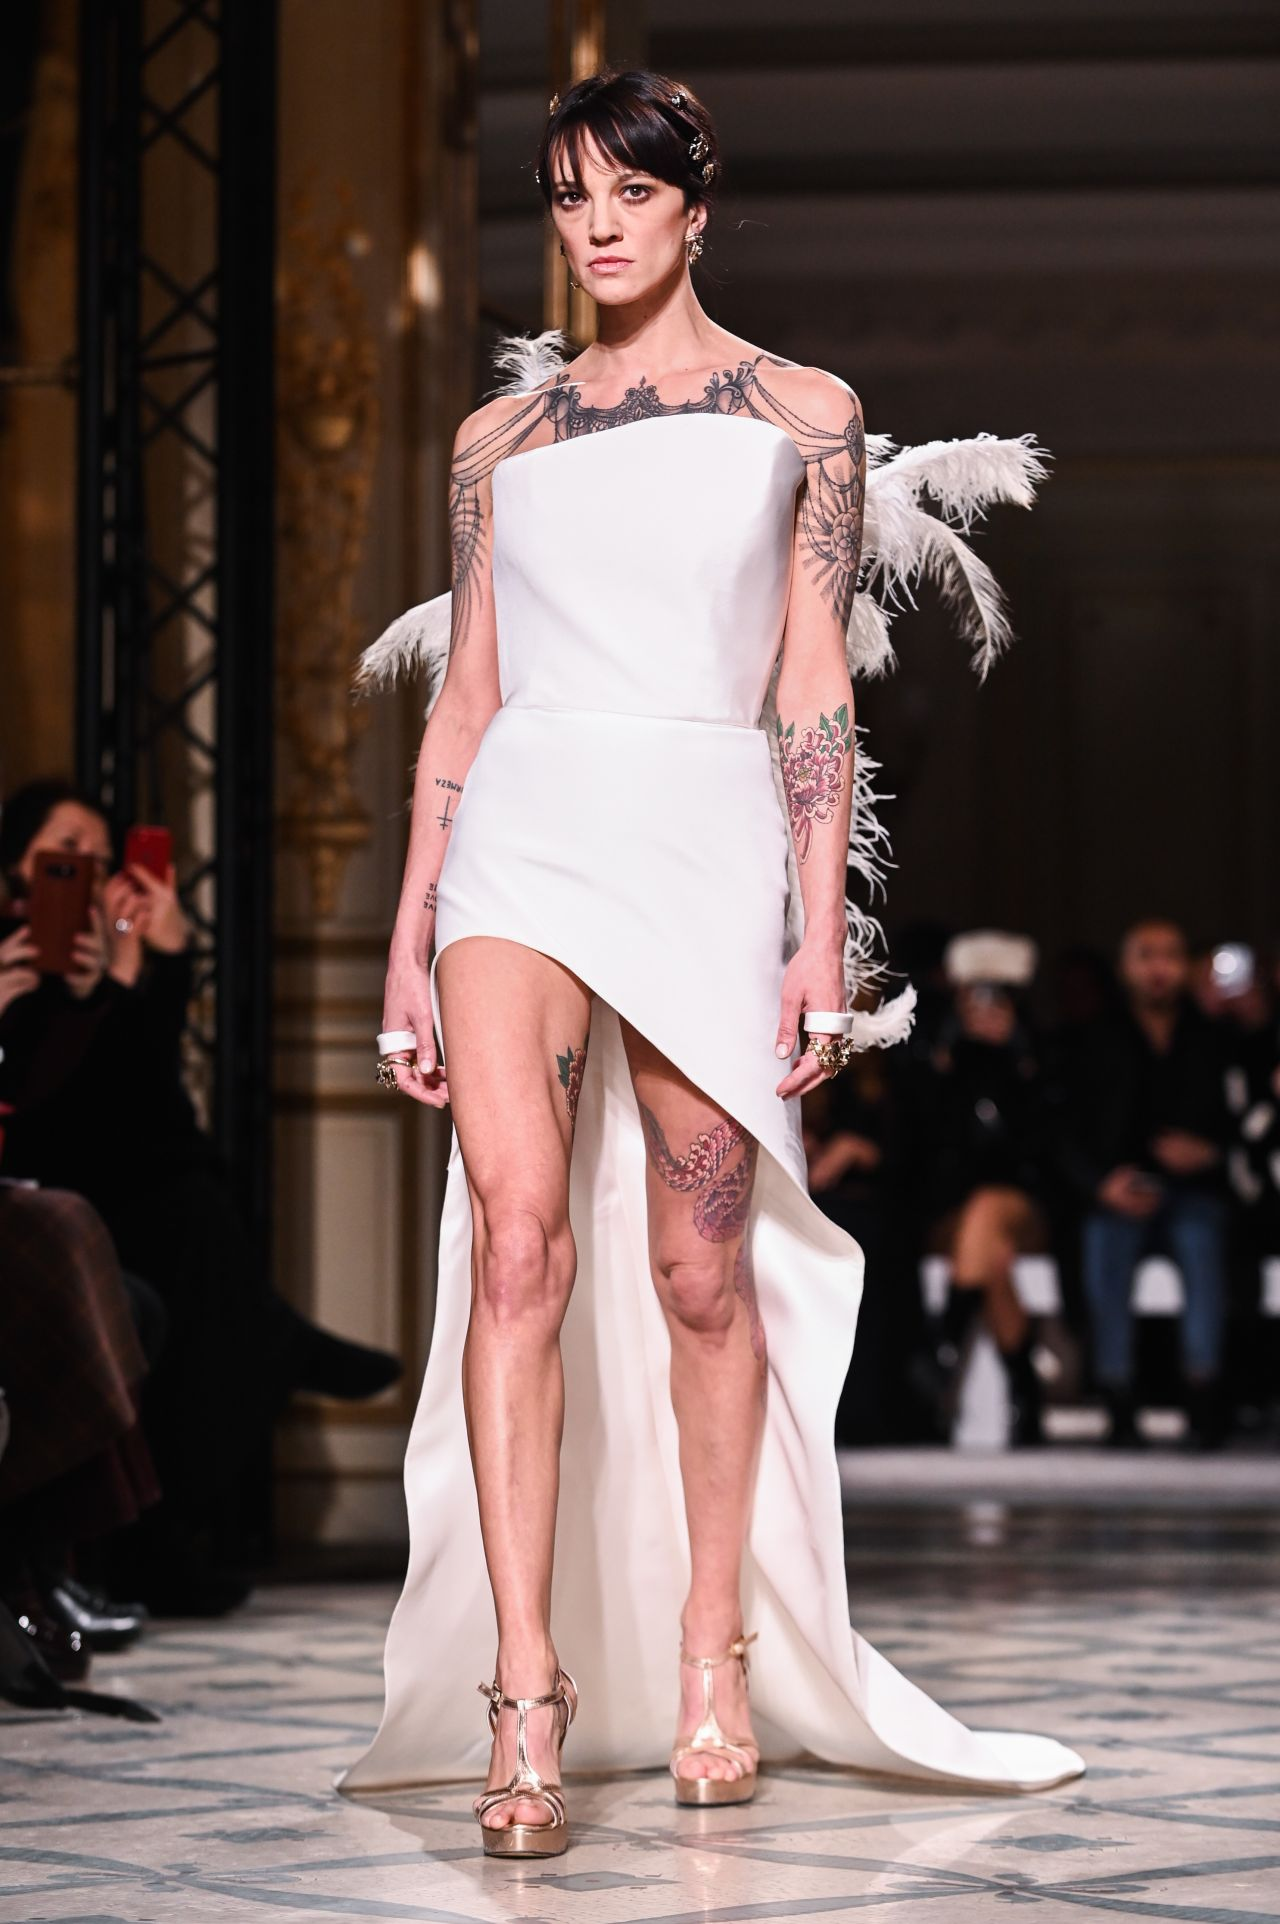 Asia Argento Walks Grimaldi Fashion Show In Paris 01212019